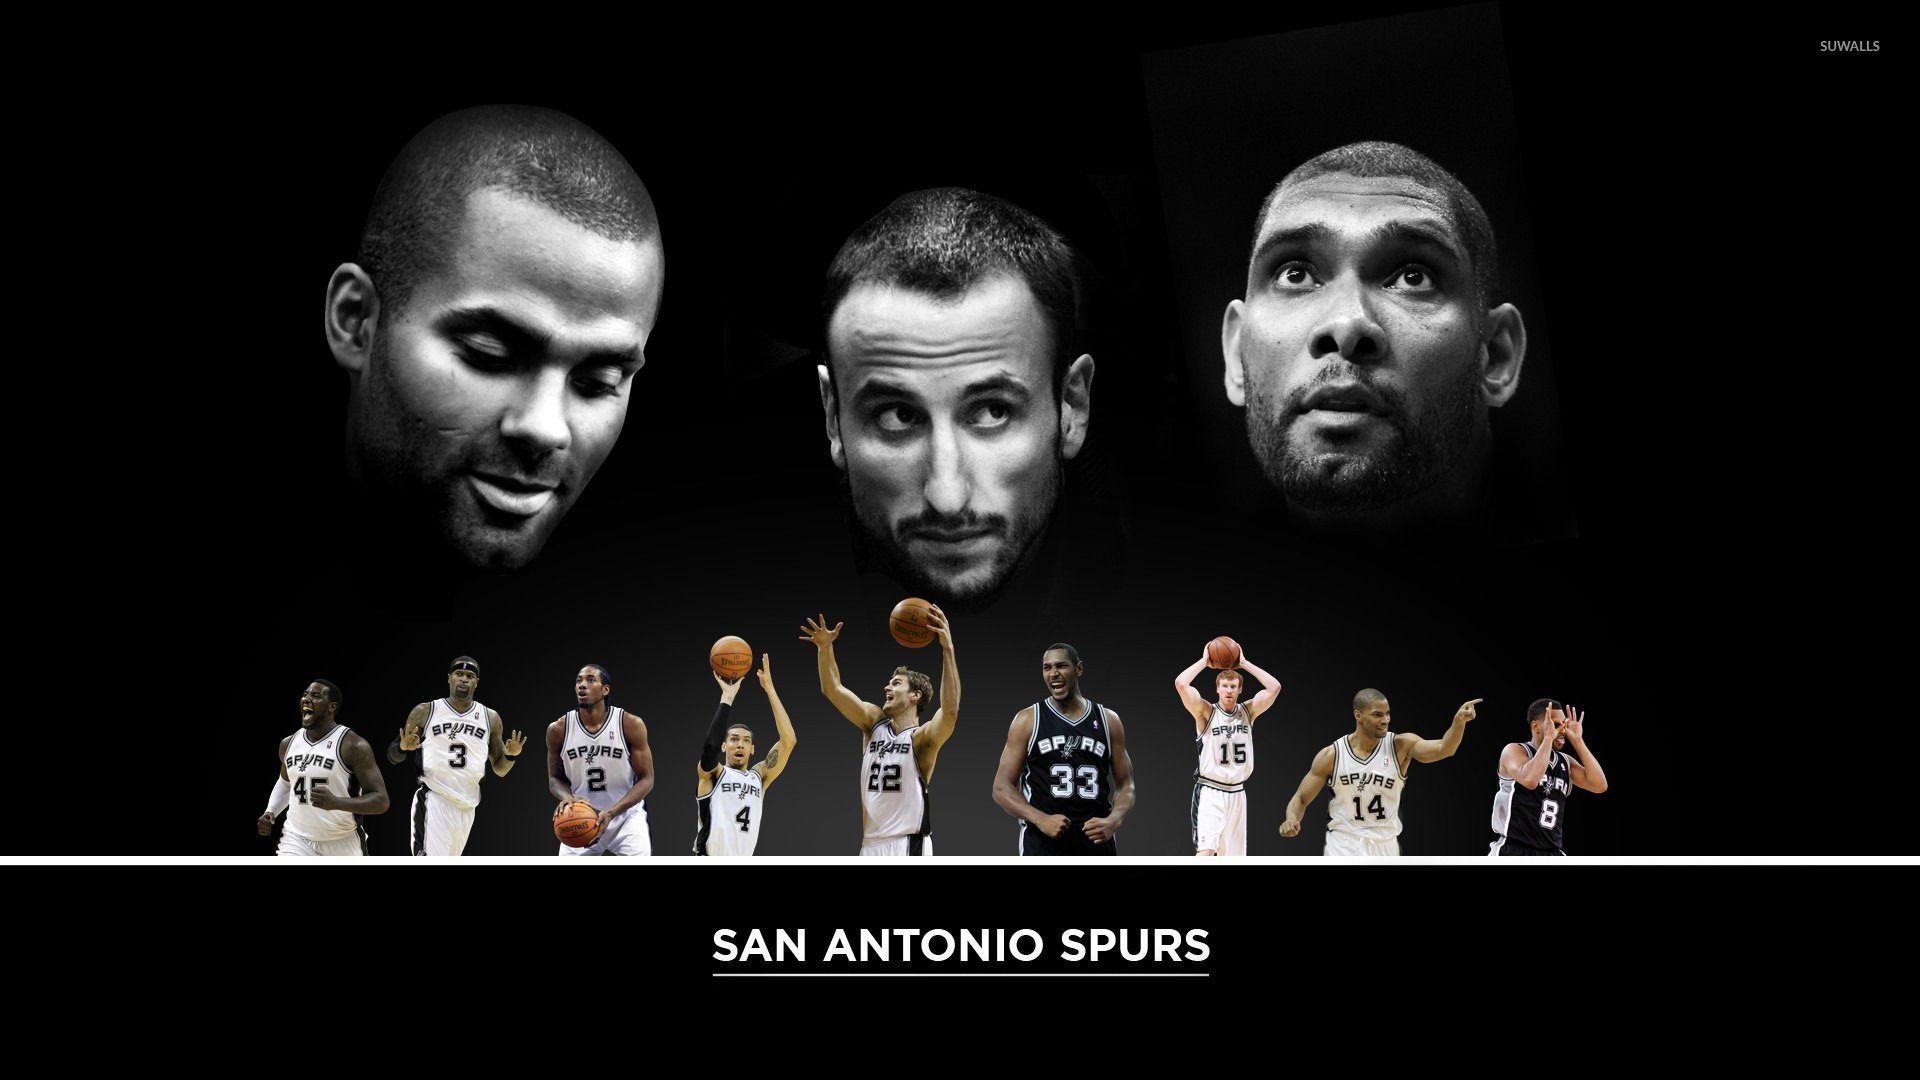 San Antonio Spurs Wallpapers Wallpapertag